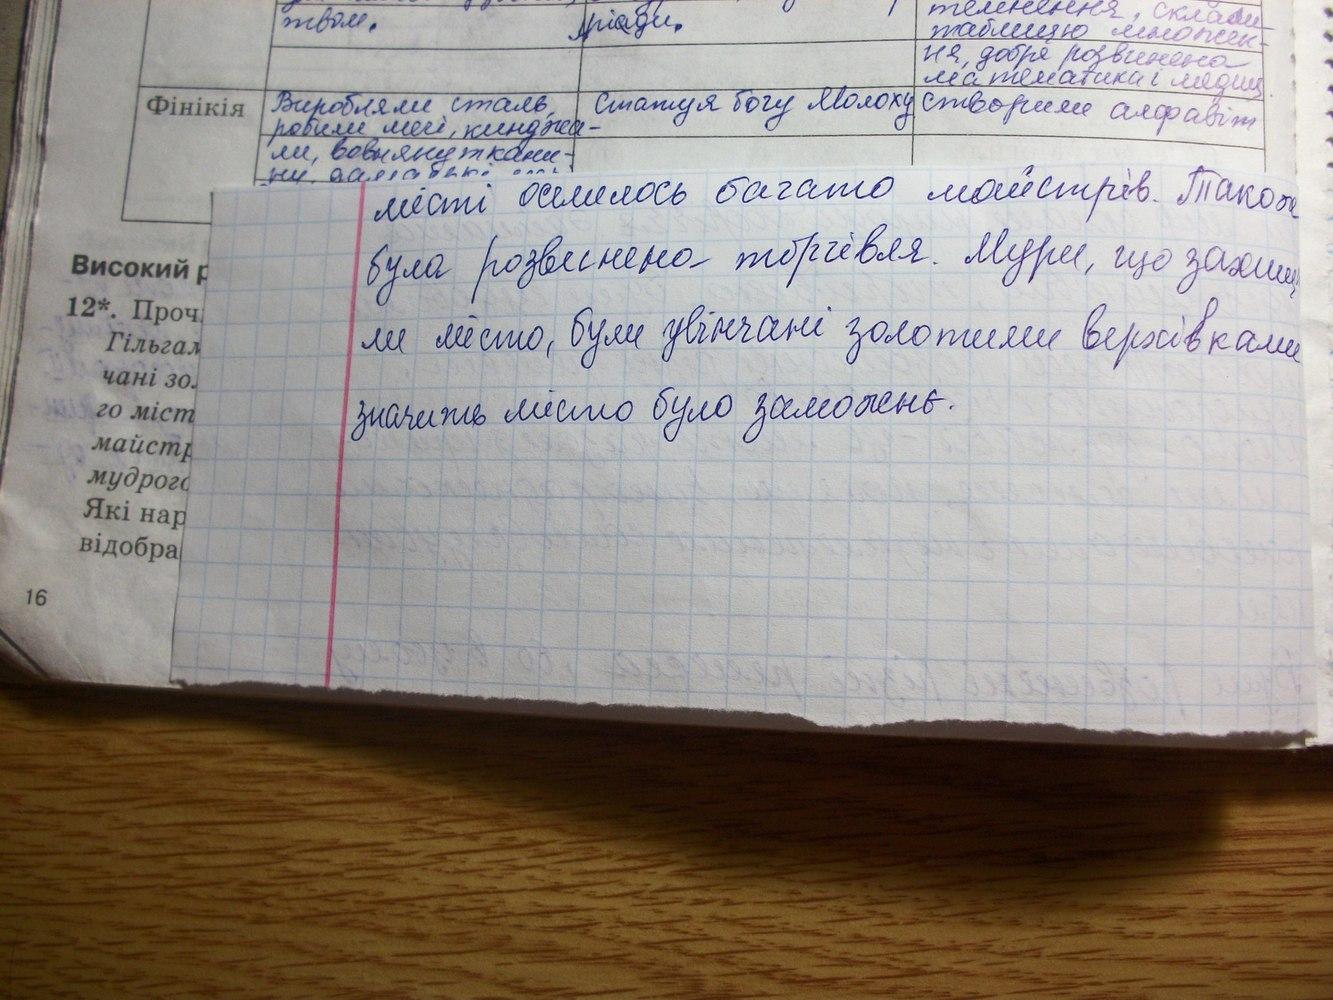 ГДЗ рабочие тетради 6 класс. Задание: стр. 16 (3)